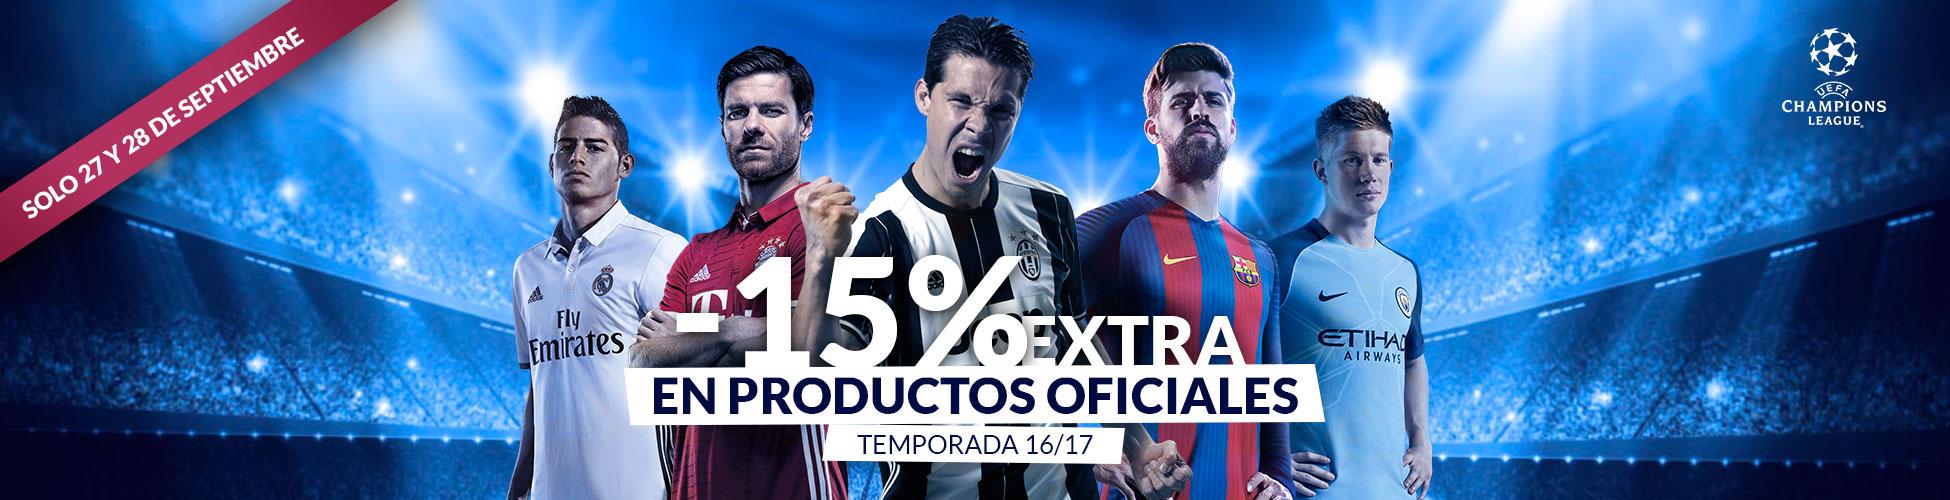 Descuento Champions 15% Septiembre ES